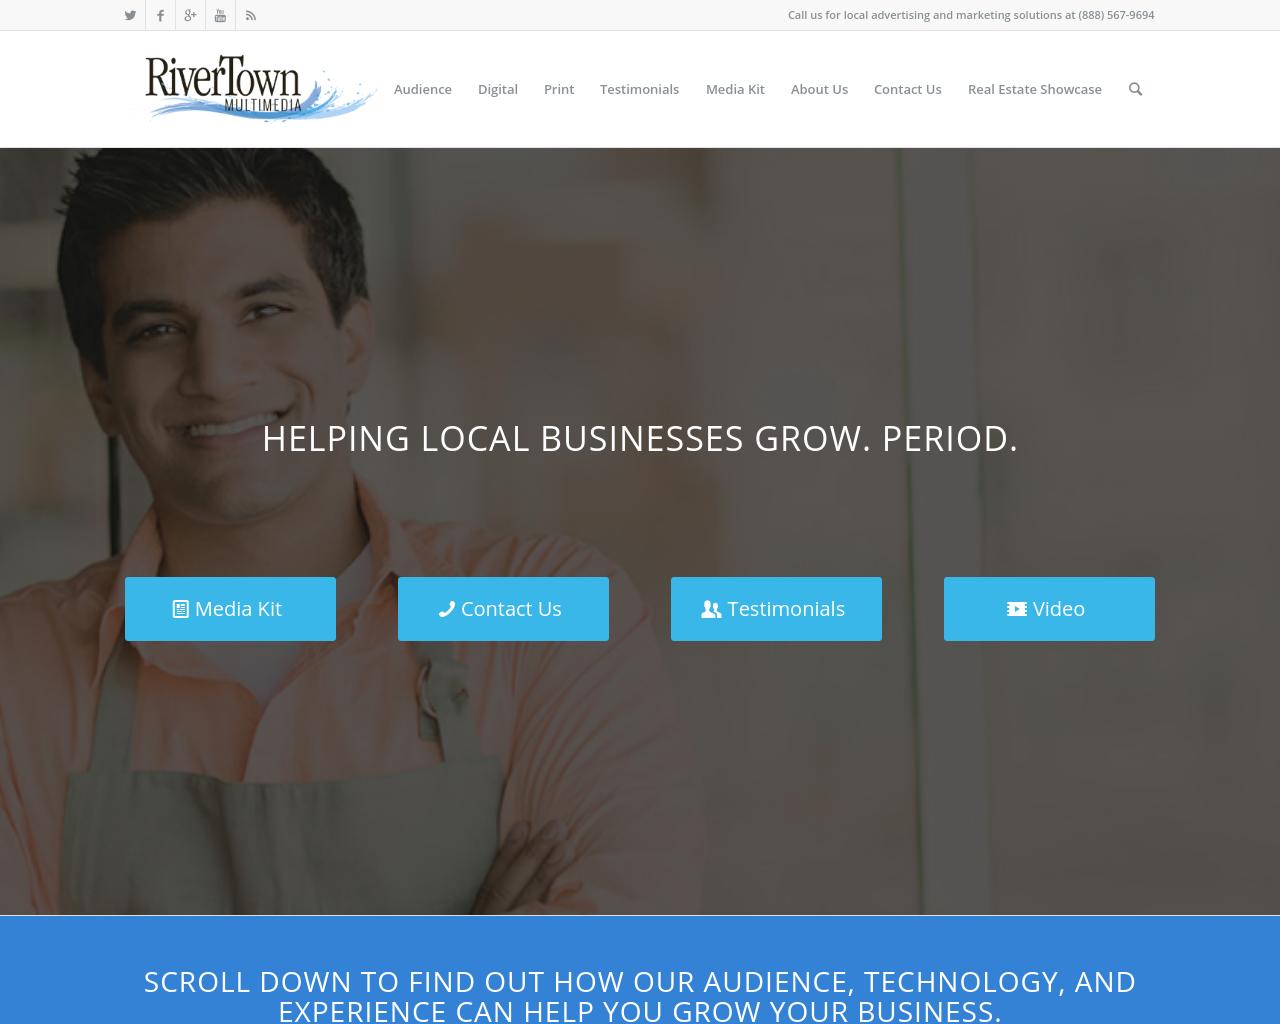 RiverTown-Multimedia-Advertising-Reviews-Pricing